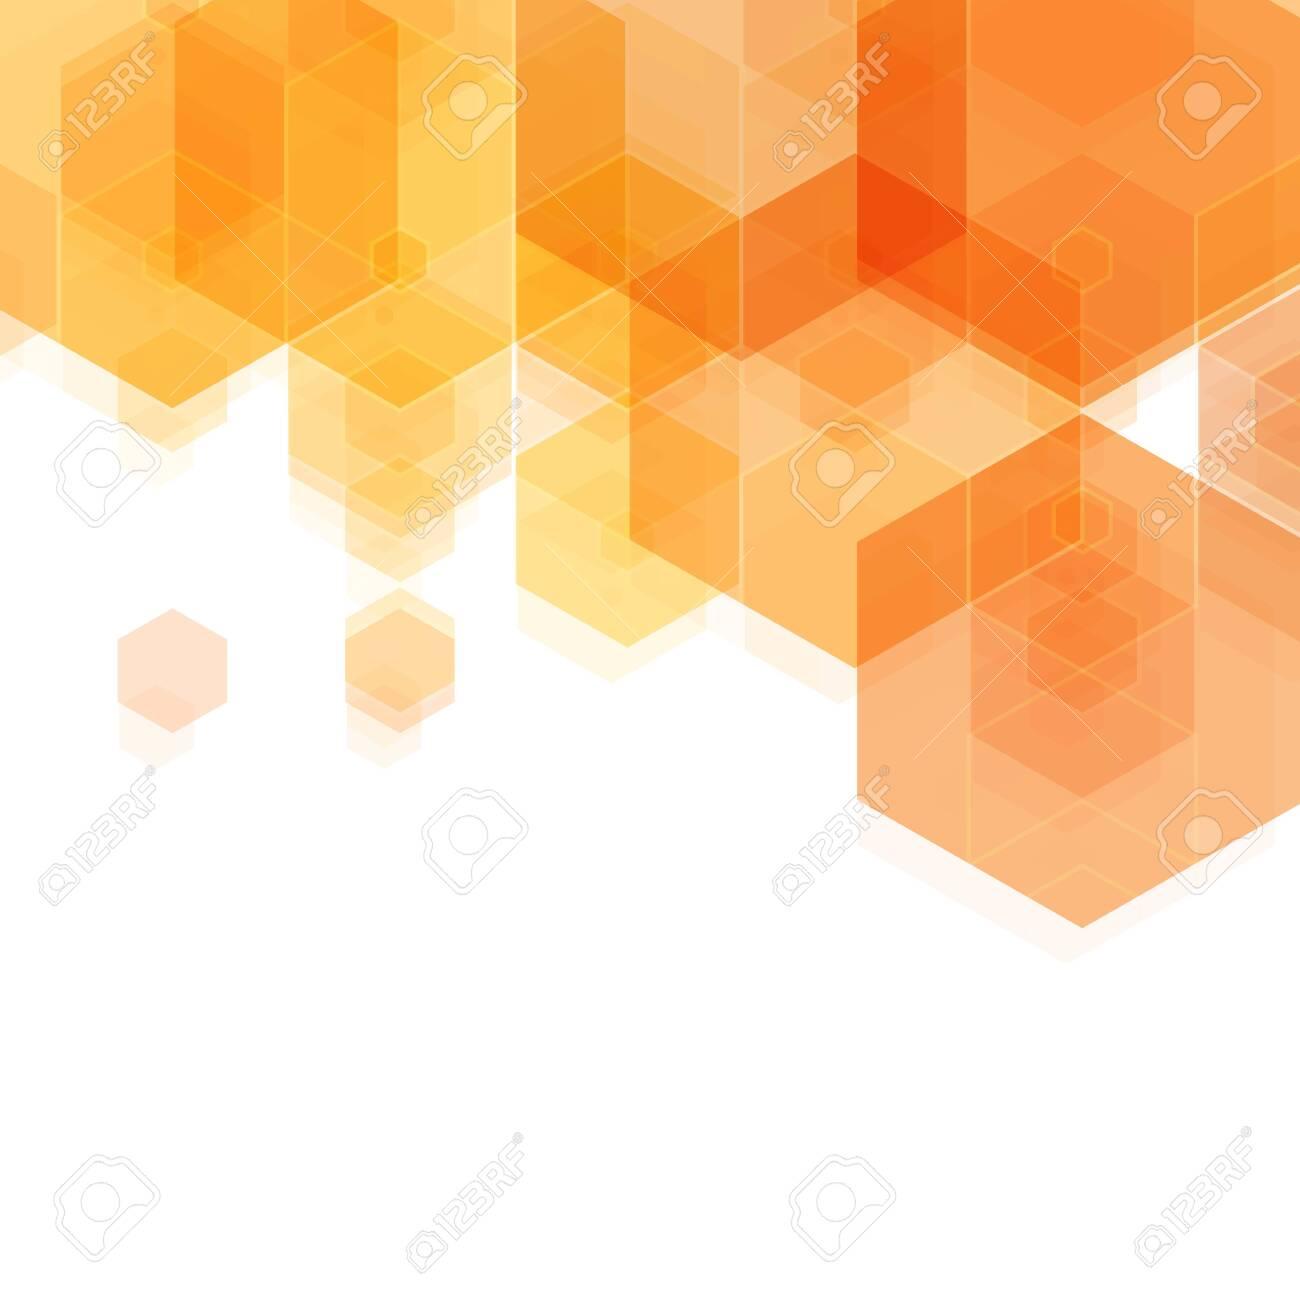 Abstract Hexagon Background Orange Vector Illustration Eps